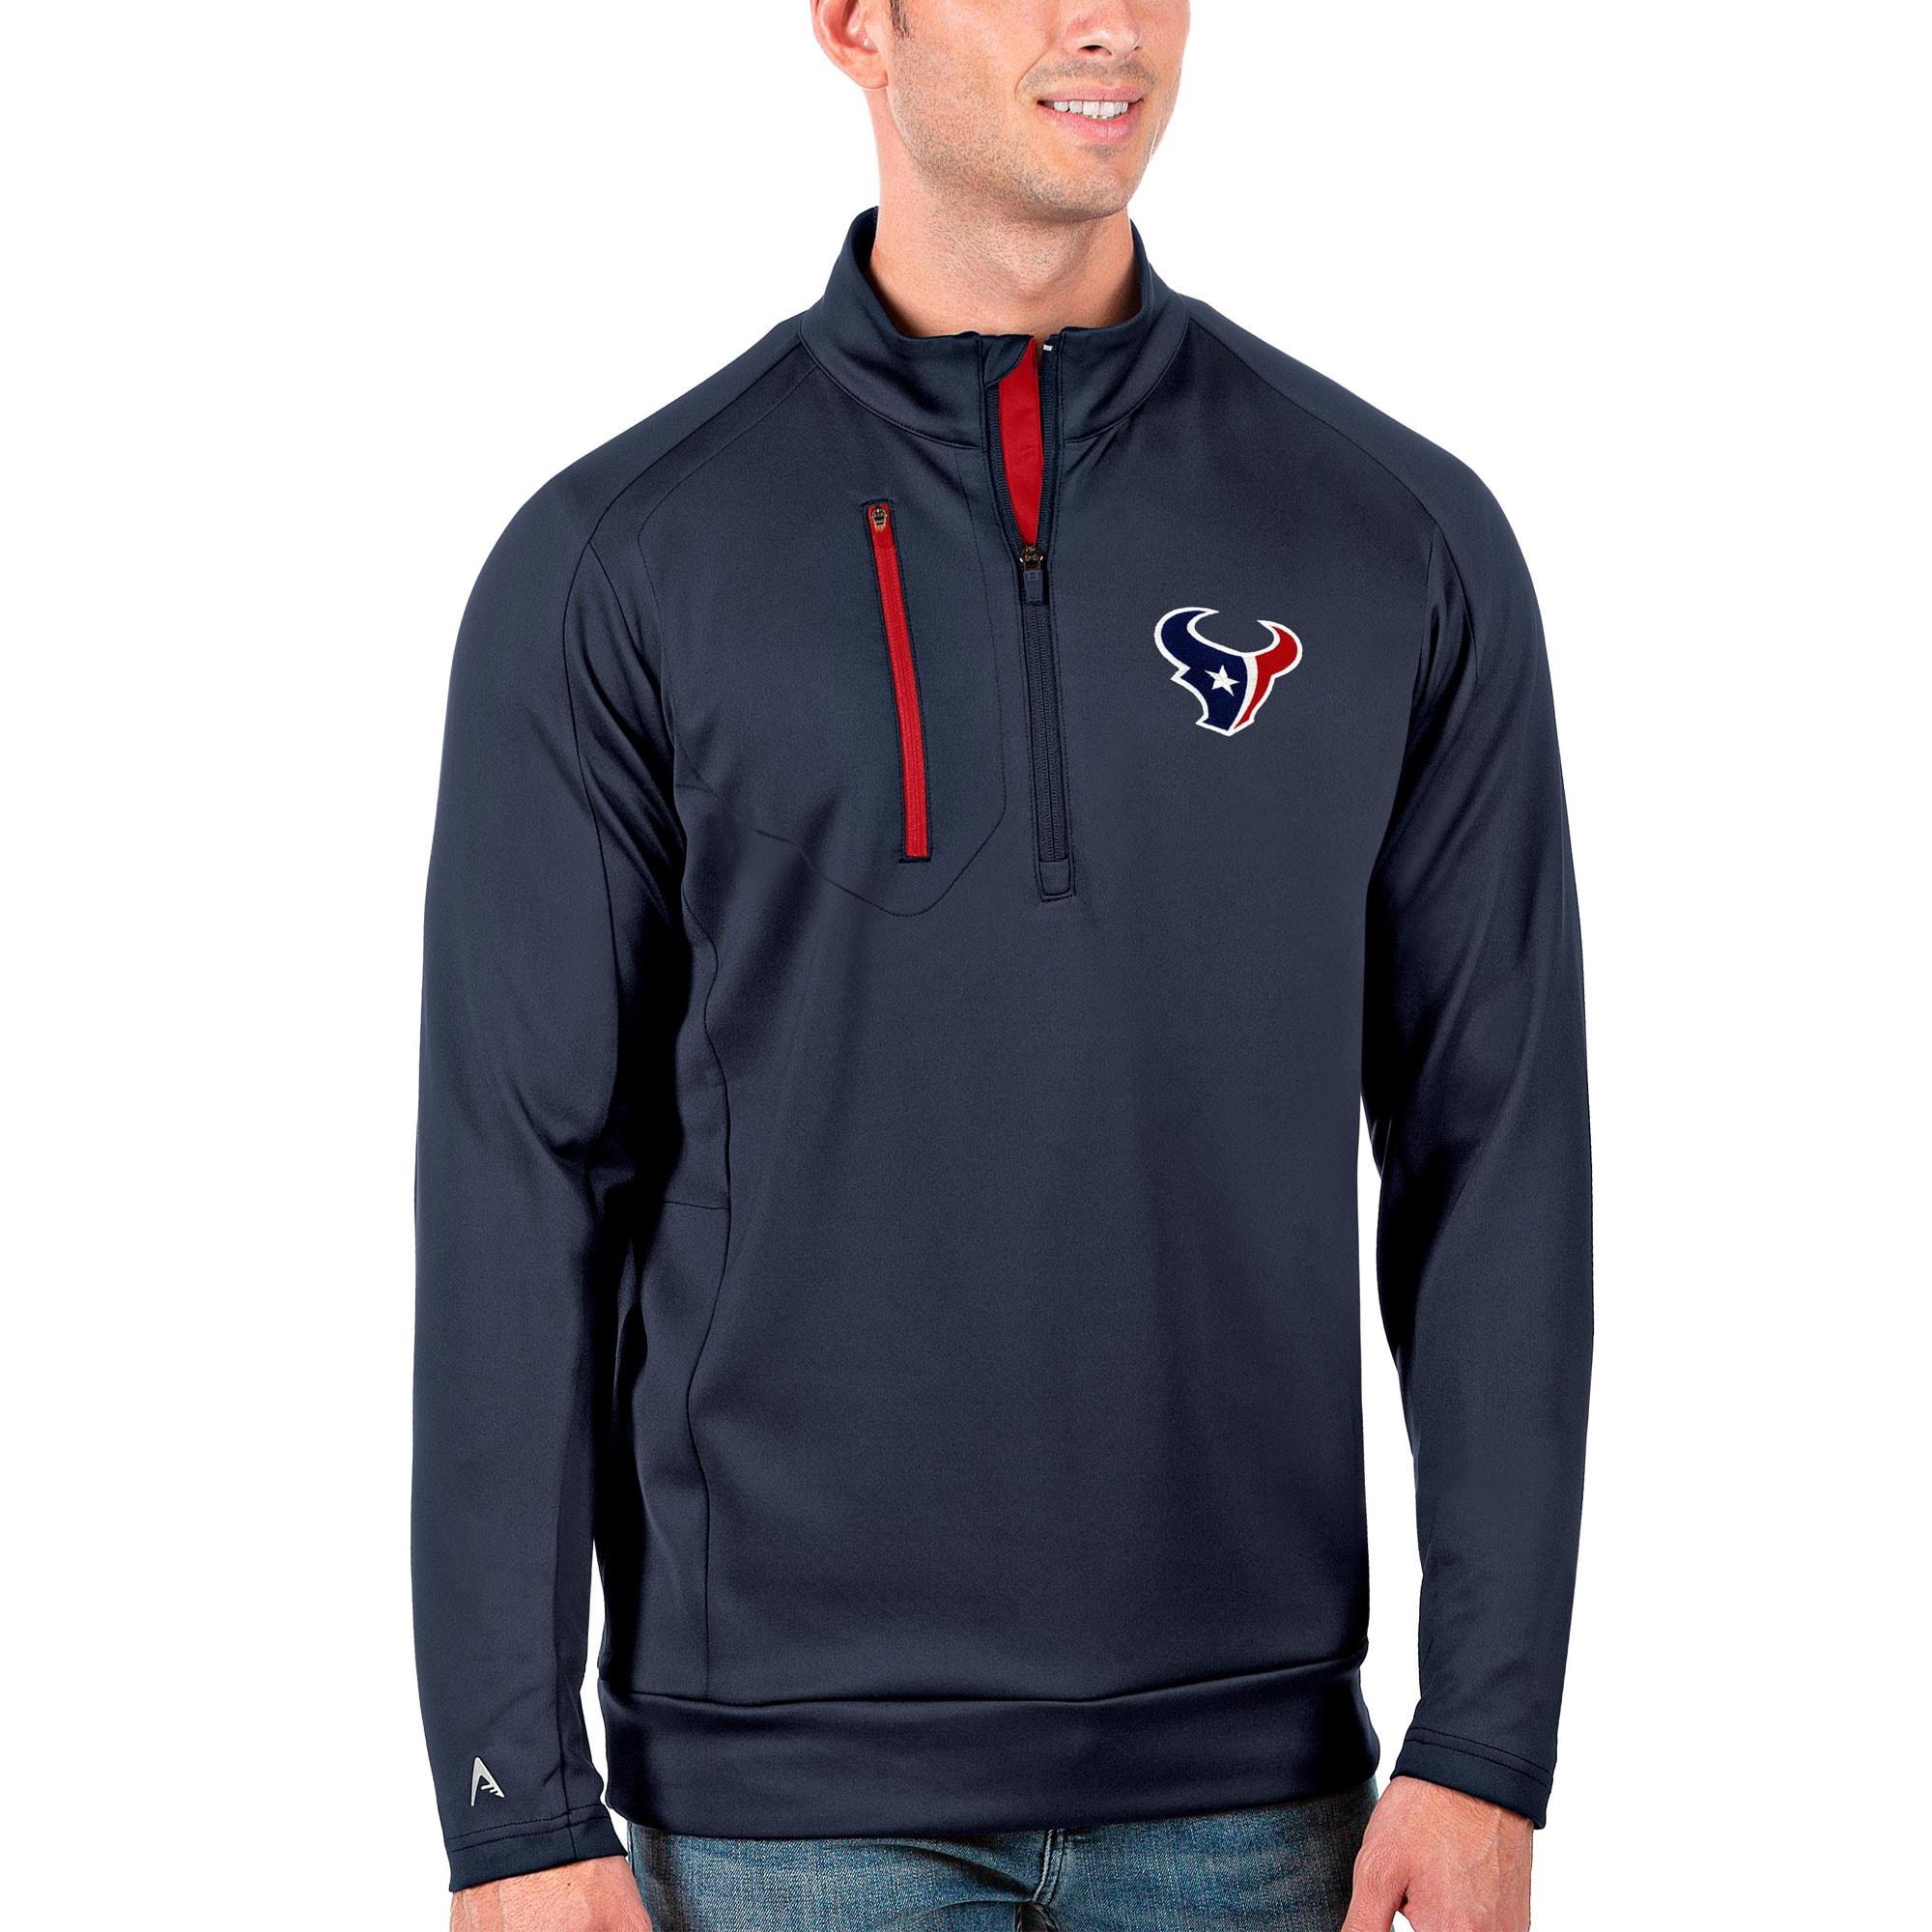 Houston Texans Antigua Generation Quarter-Zip Pullover Jacket - Navy/Red